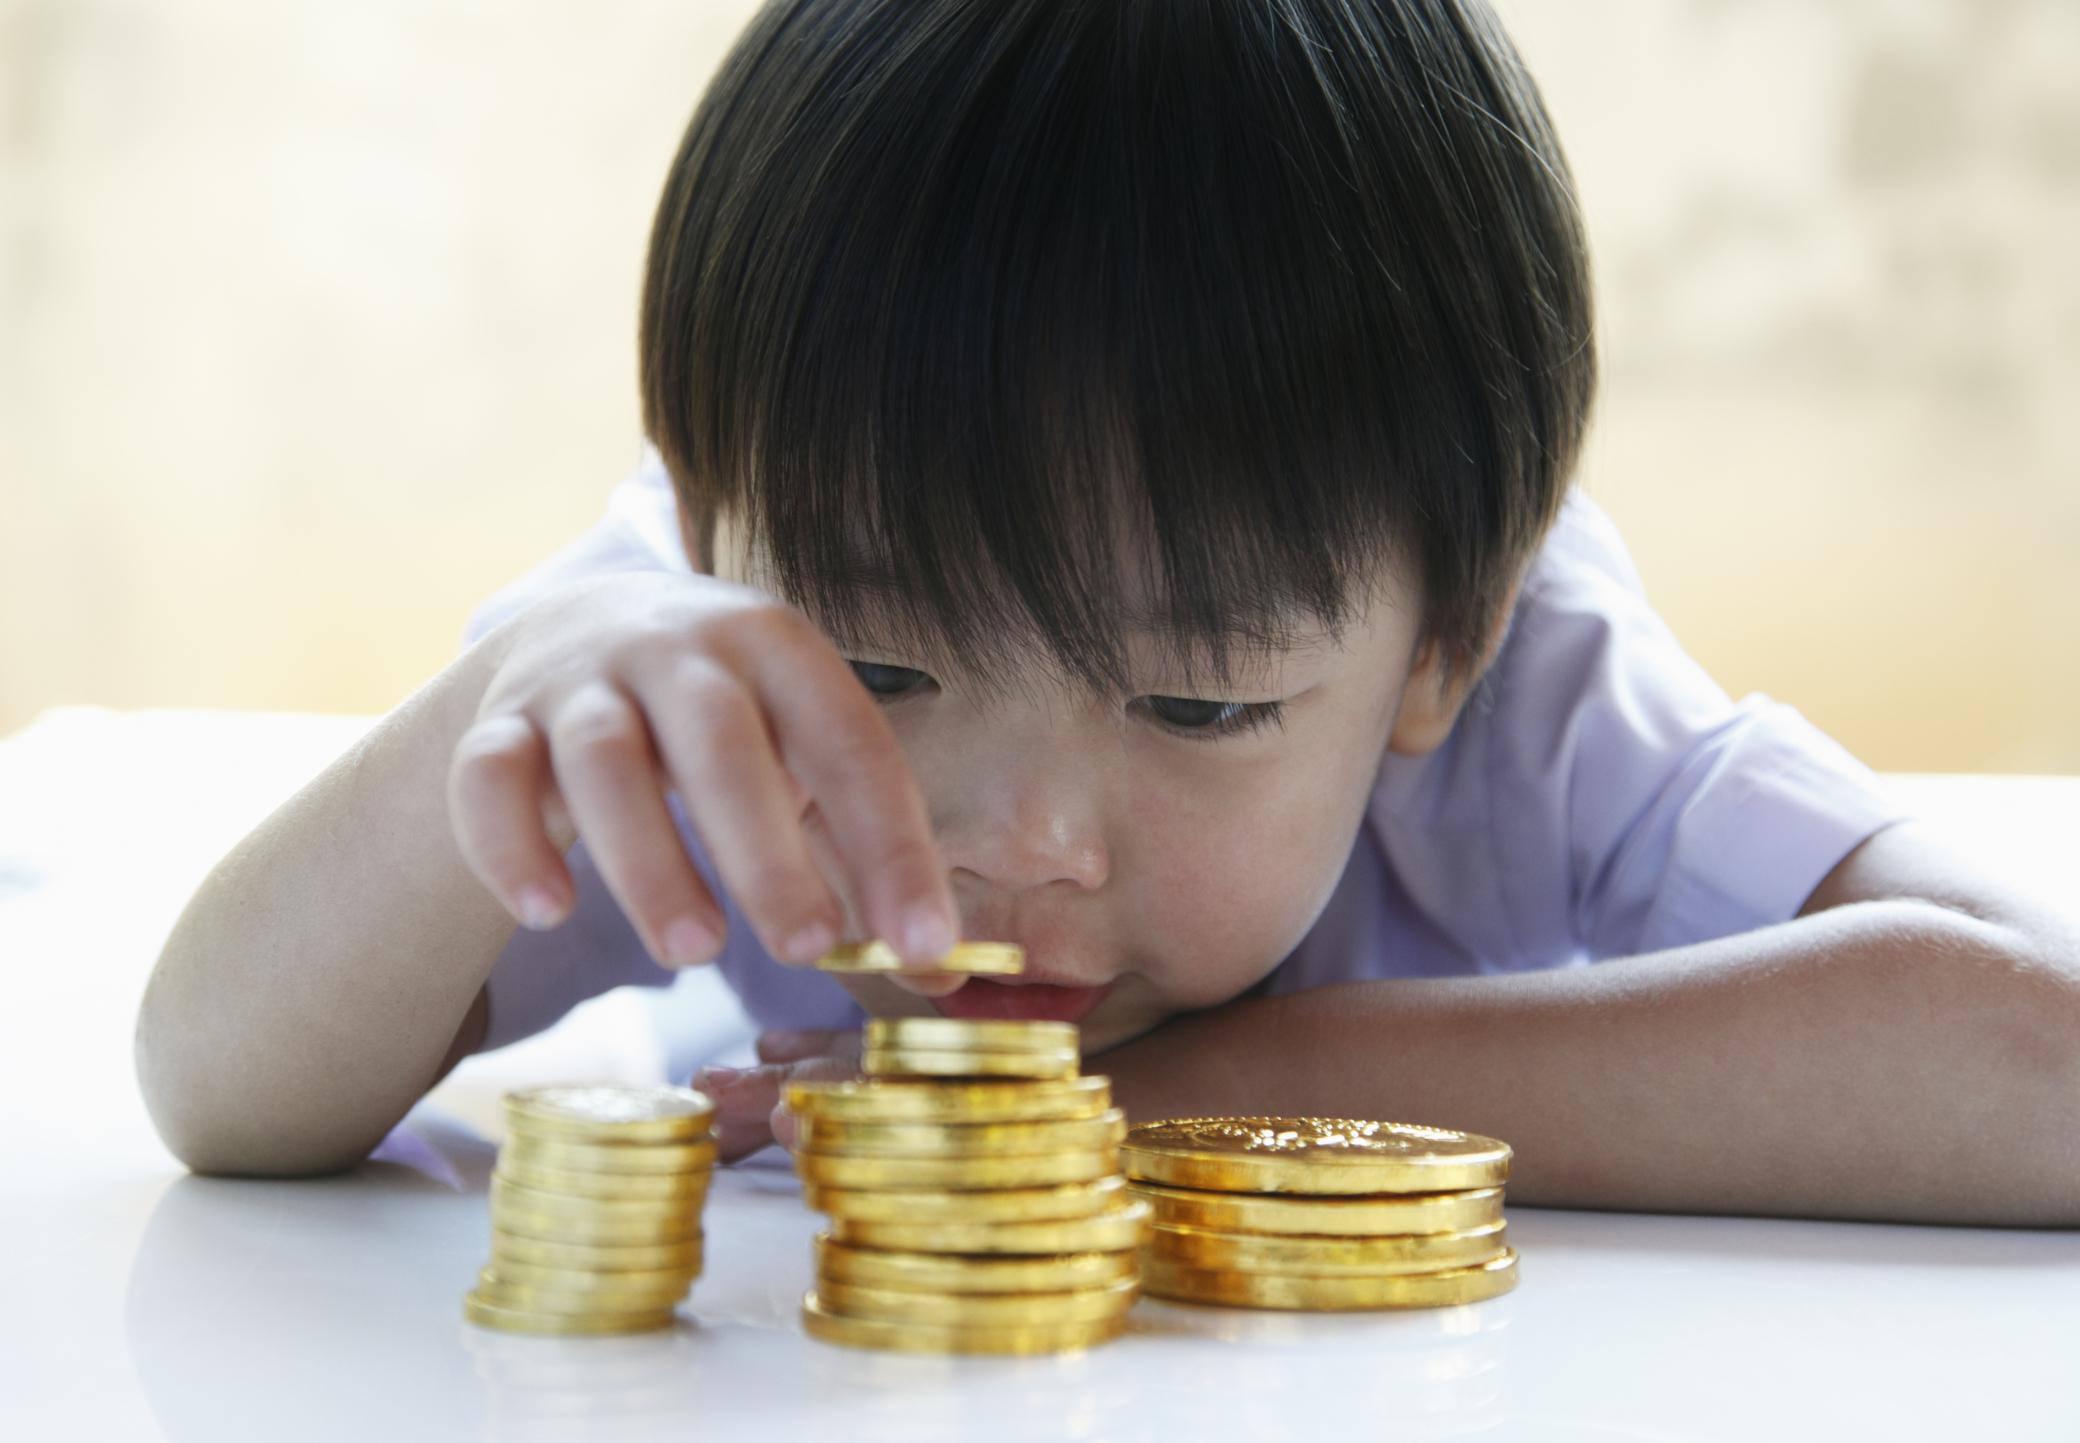 Reward your child's good behavior with tokens.